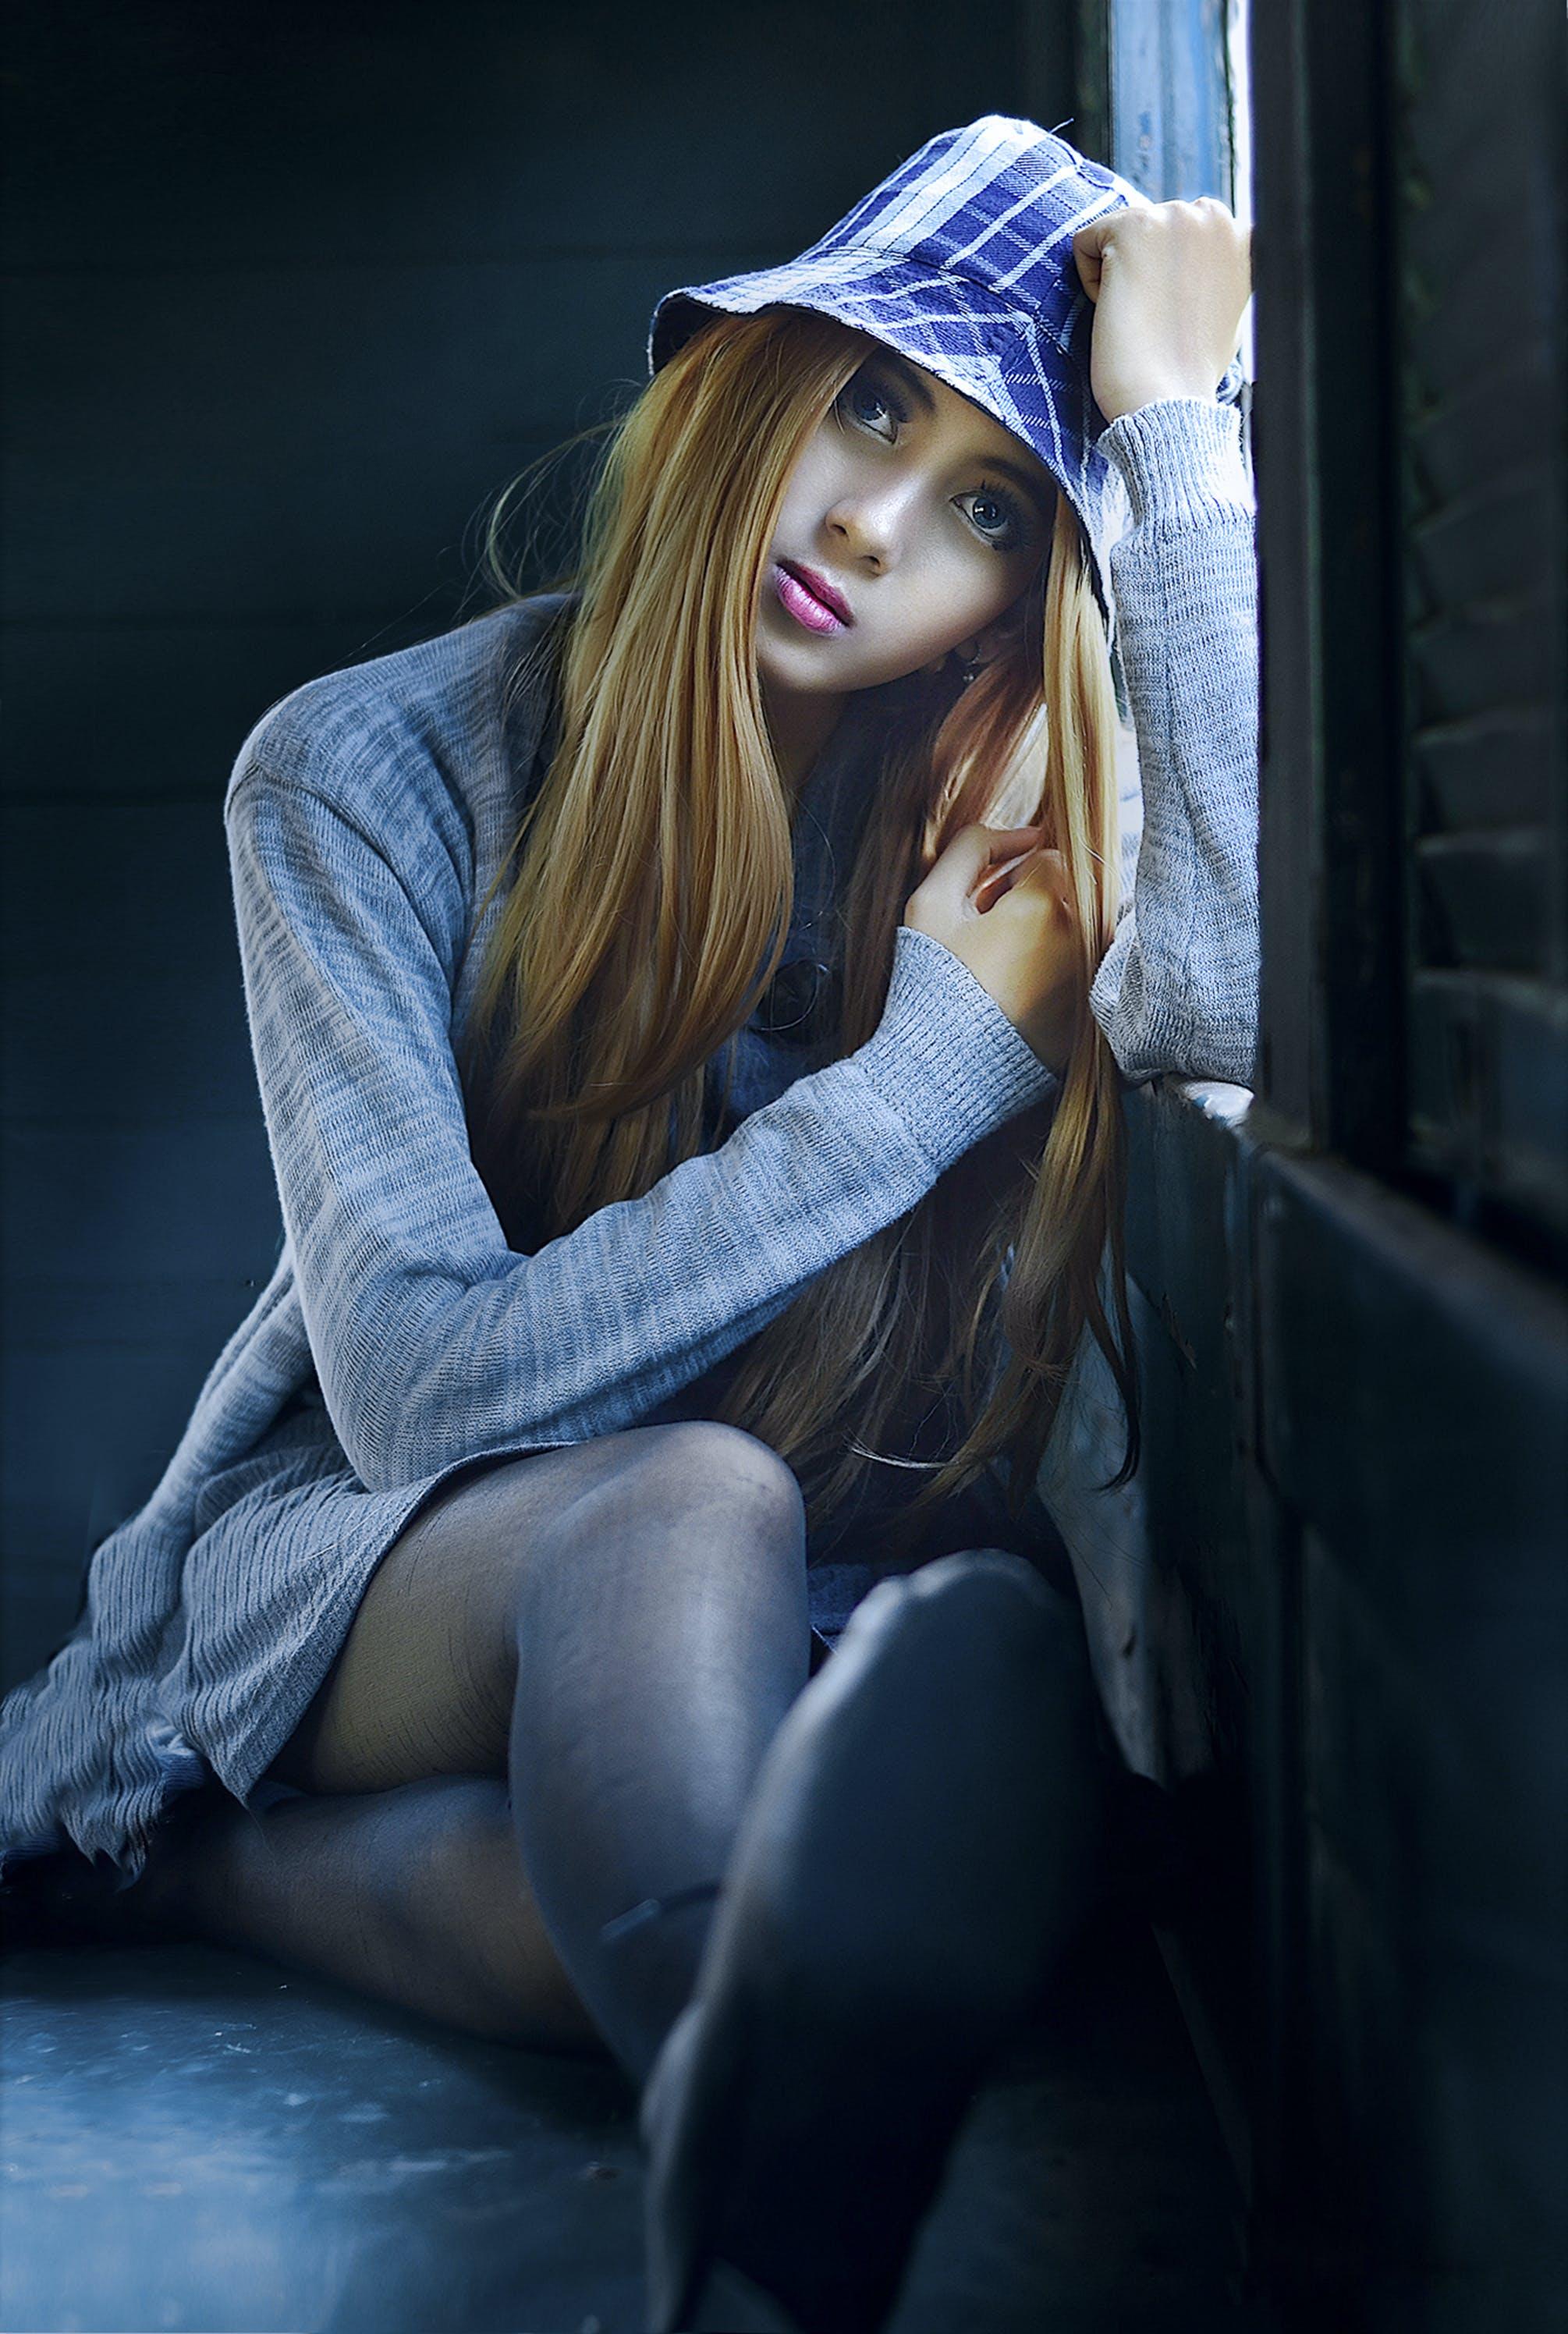 Woman Wearing Heather-gray Cardigan Leaning on Window